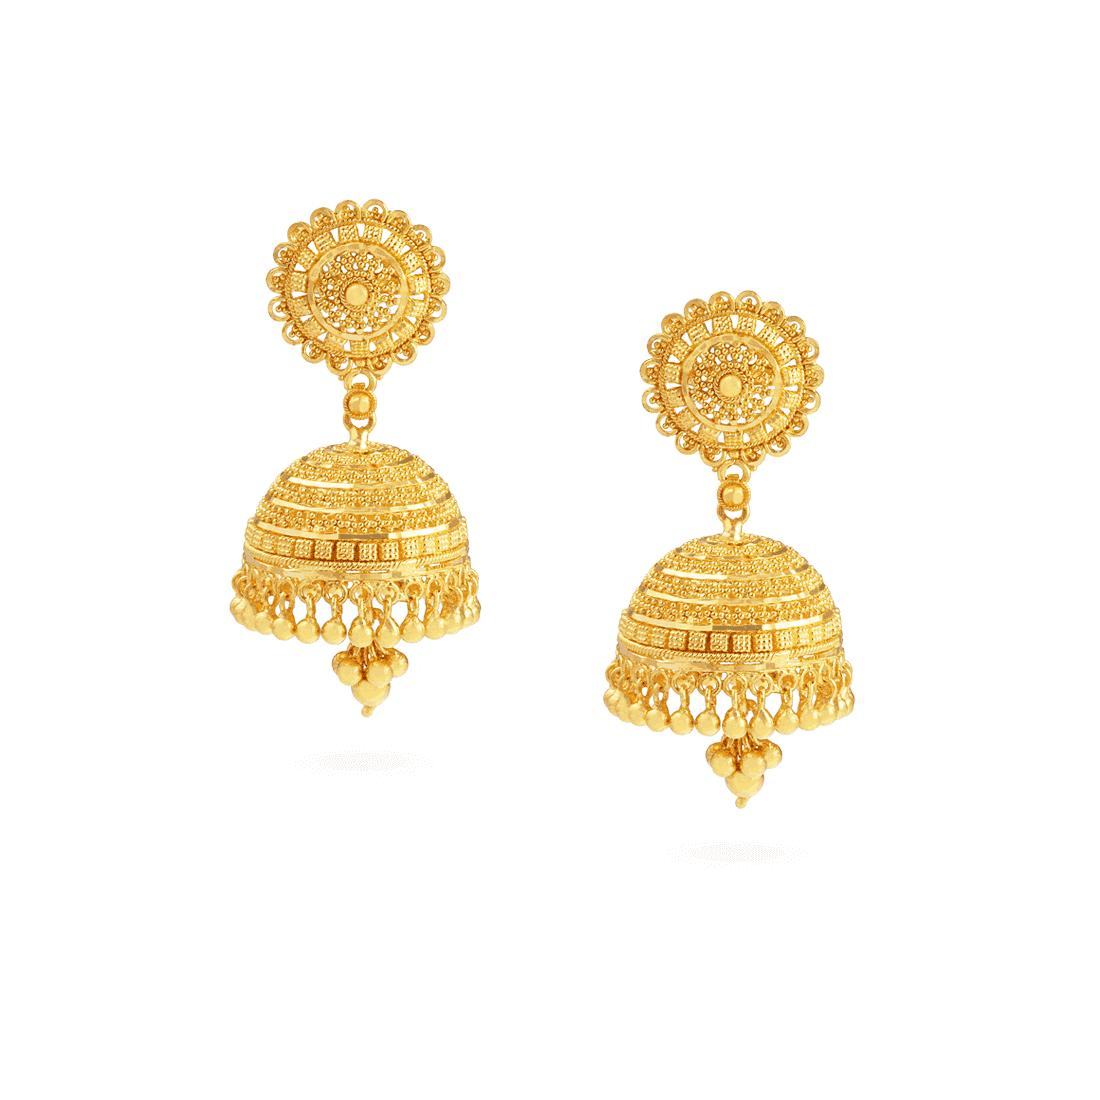 22778 - Jali 22ct Gold Filigree Earrings